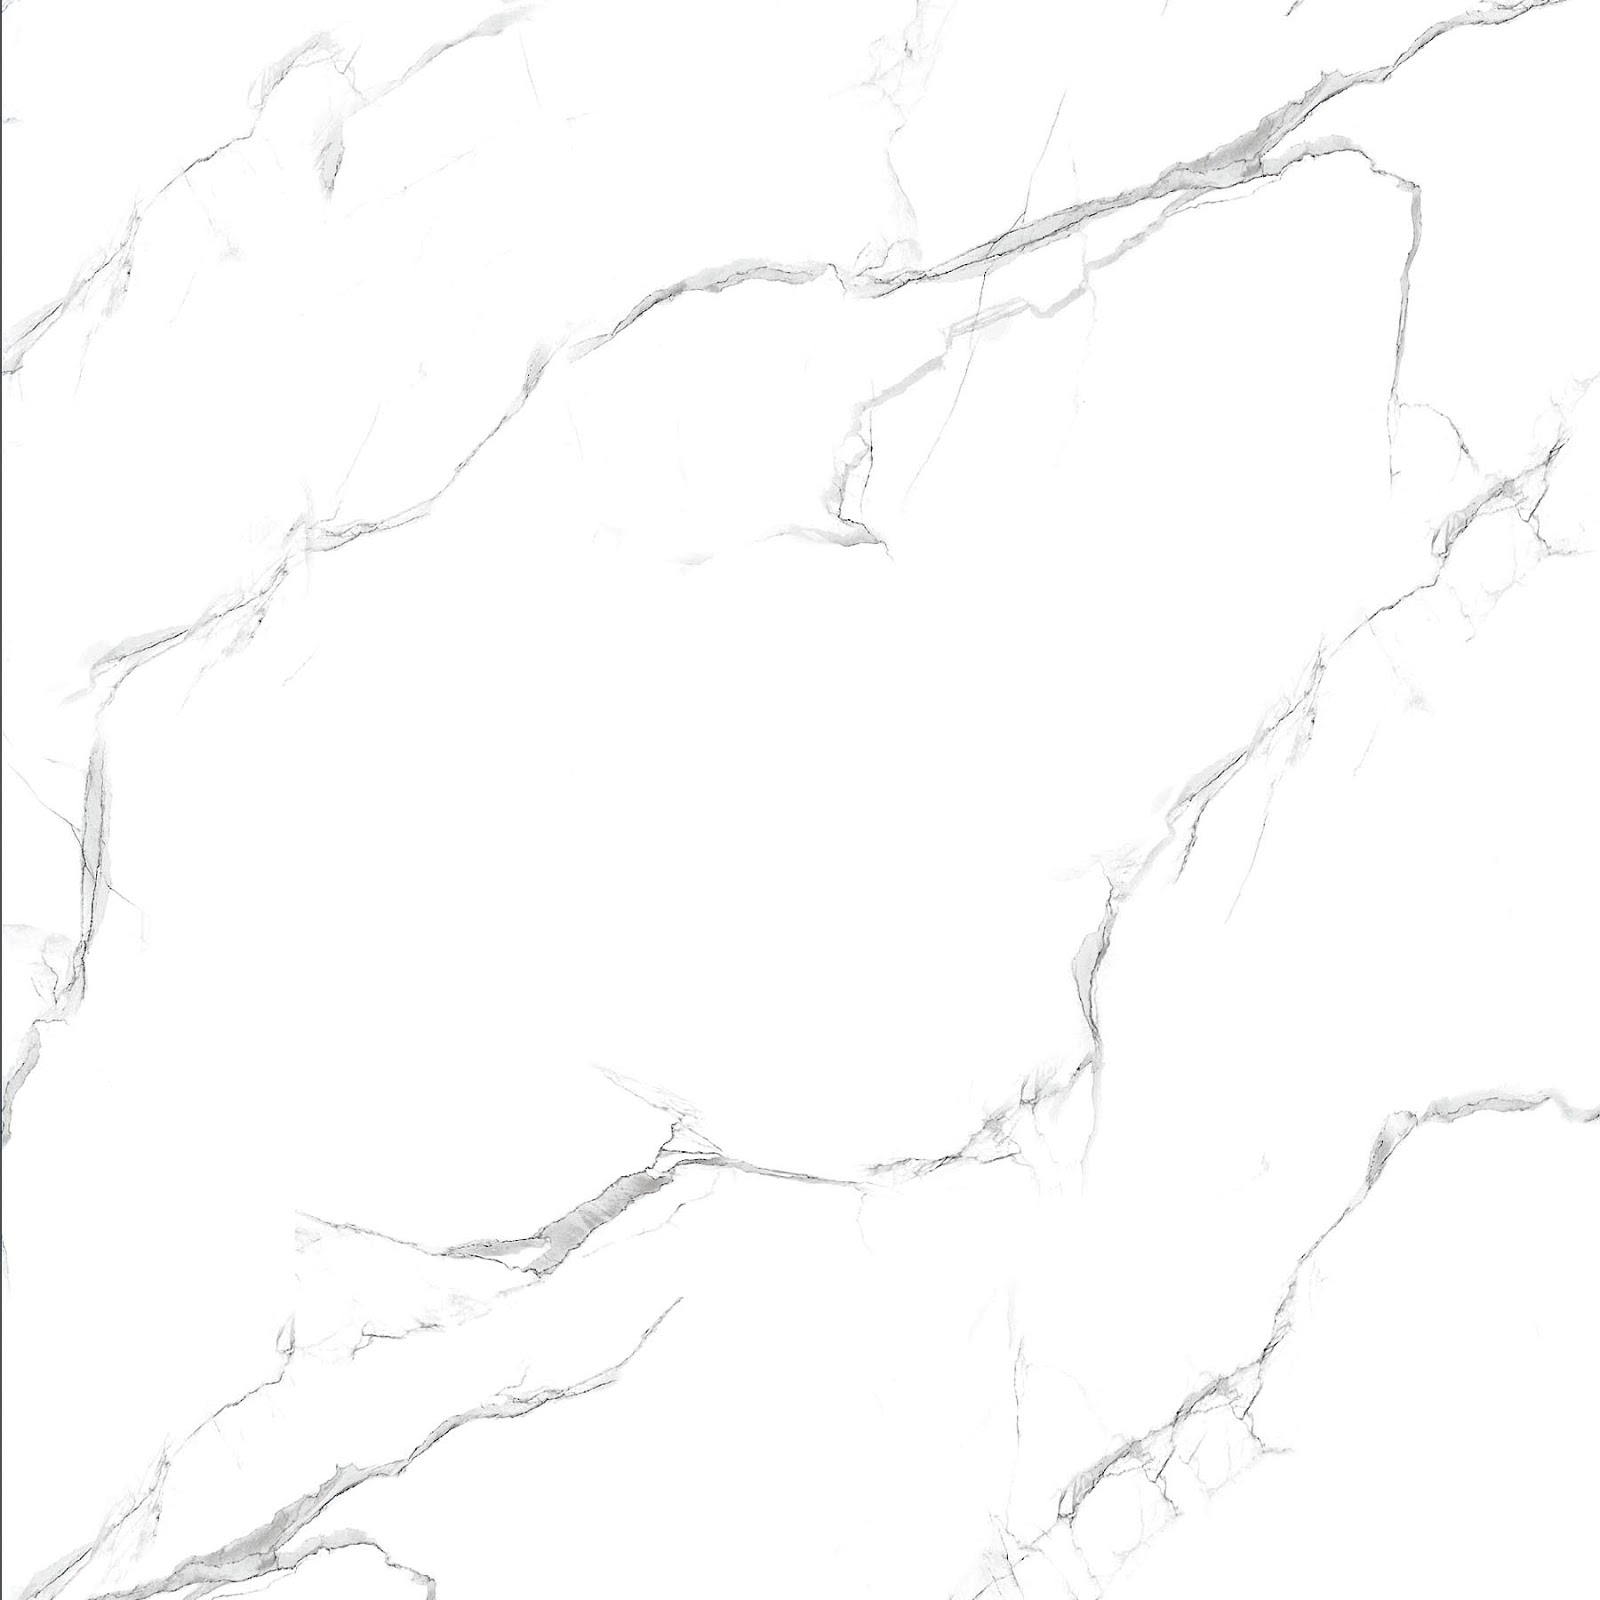 High Definition Digital Vitrified Tiles